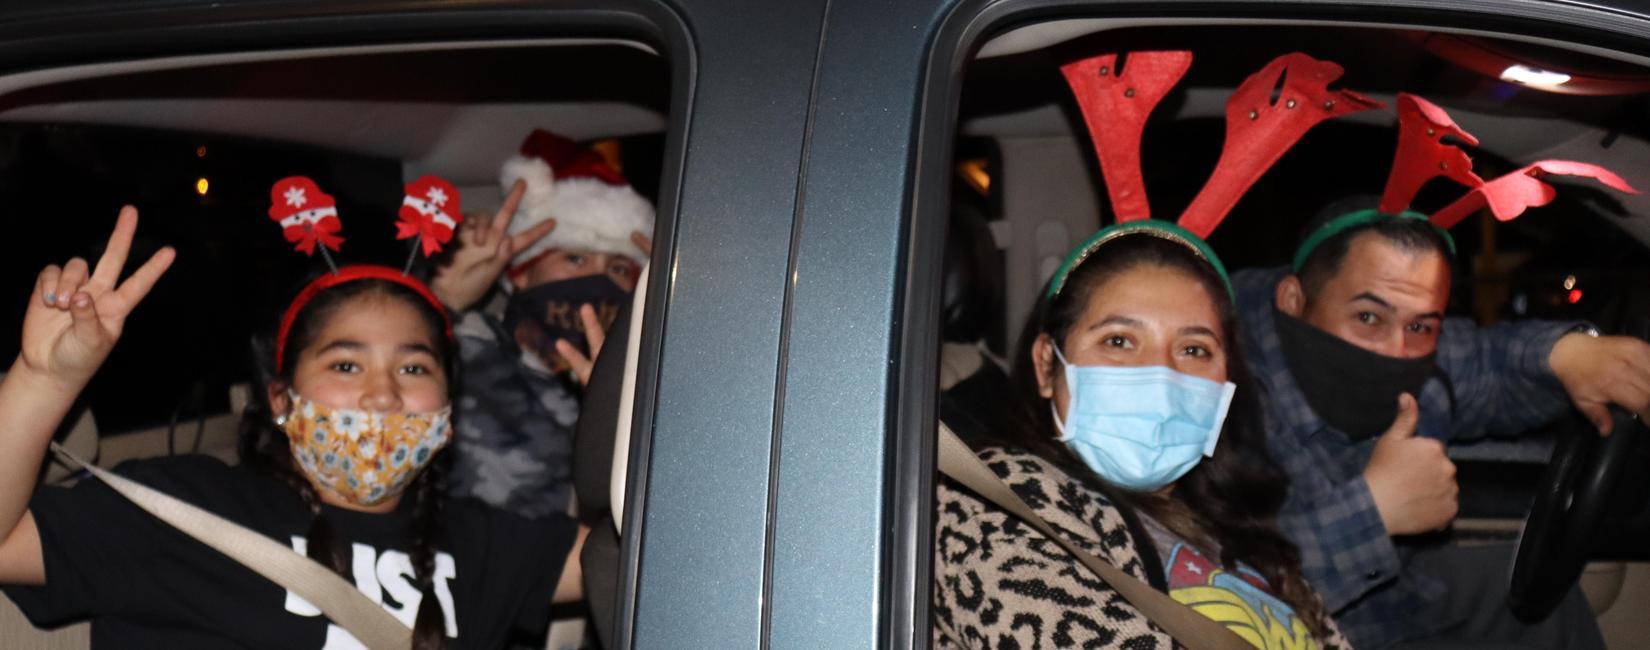 Rio Vista family participates in Drive-Thru parade